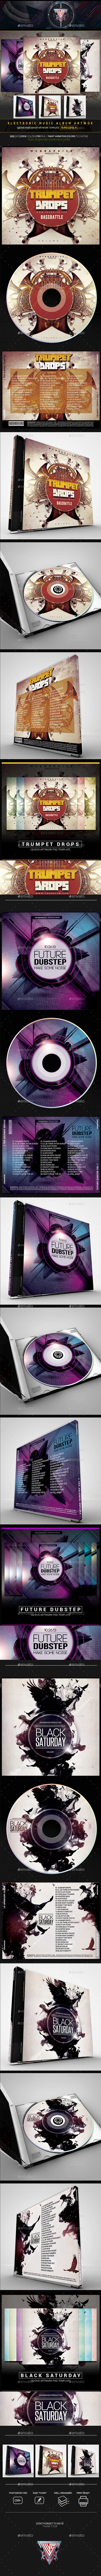 Electro Music CD/DVD Template Bundle Vol. 4 - CD & DVD Artwork Print Templates